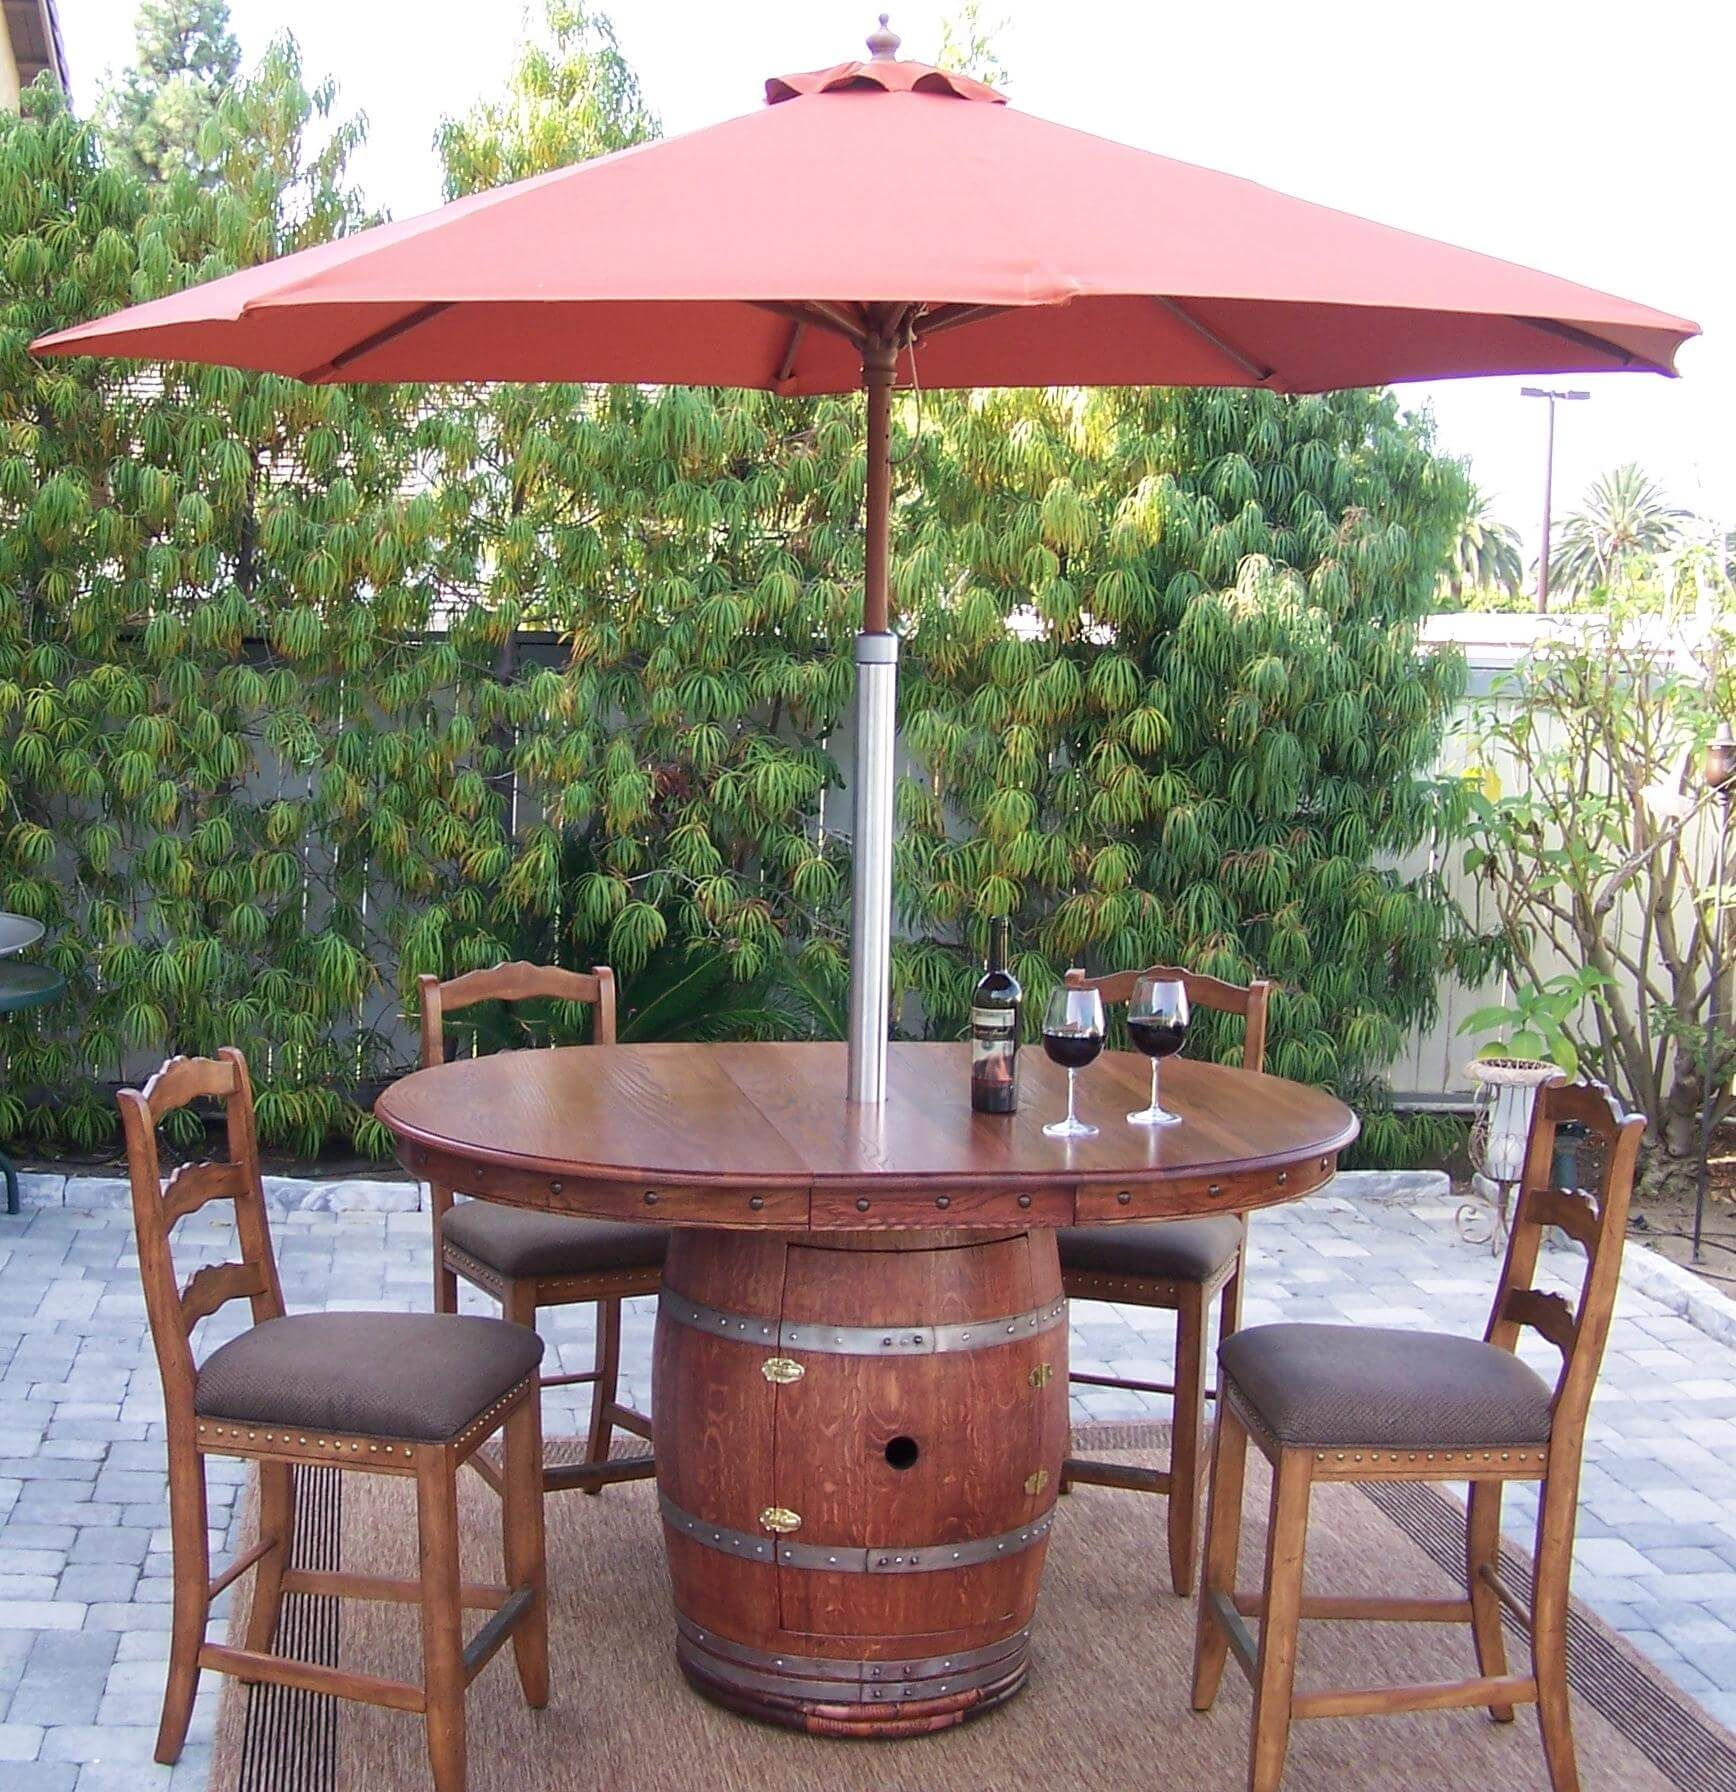 Napa Style Wine Barrel Patio Table